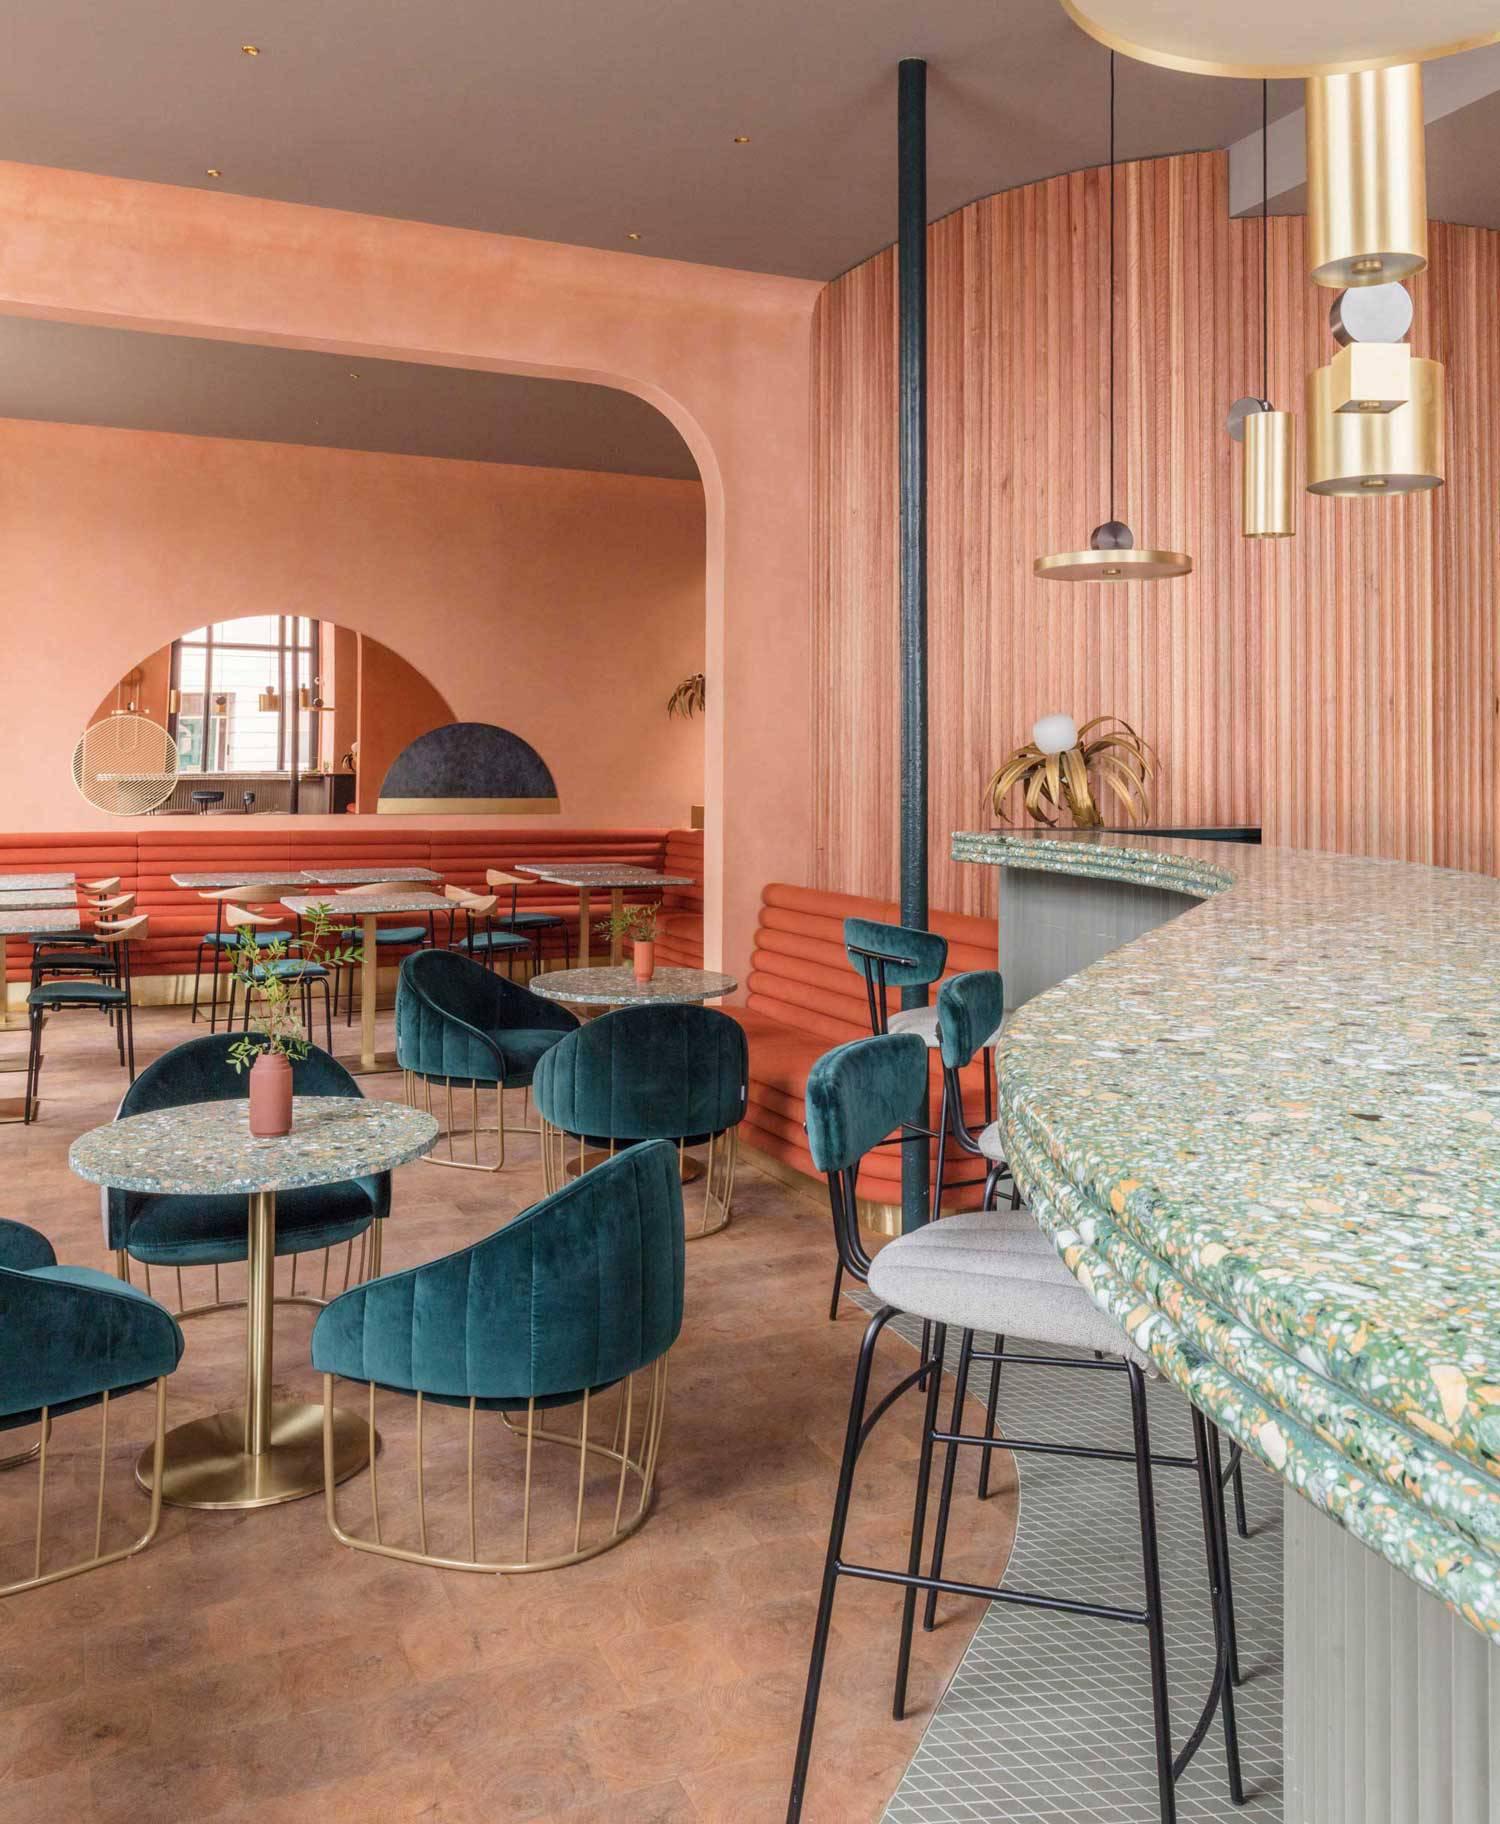 omars-place-stella-concept-restaurant-london-4.jpg